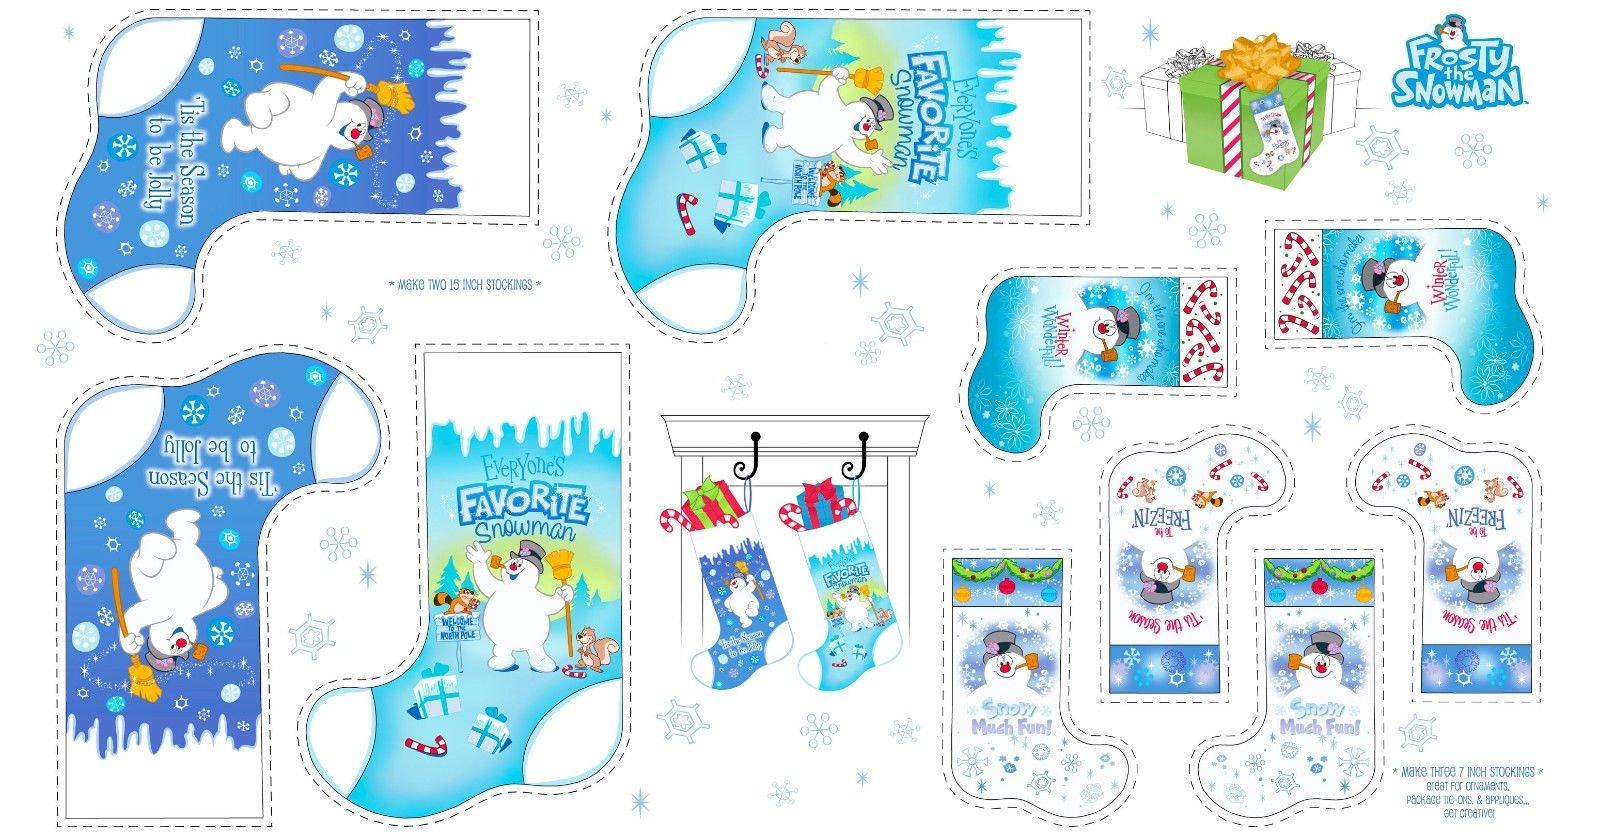 Favorite Snowman Stocking Panel